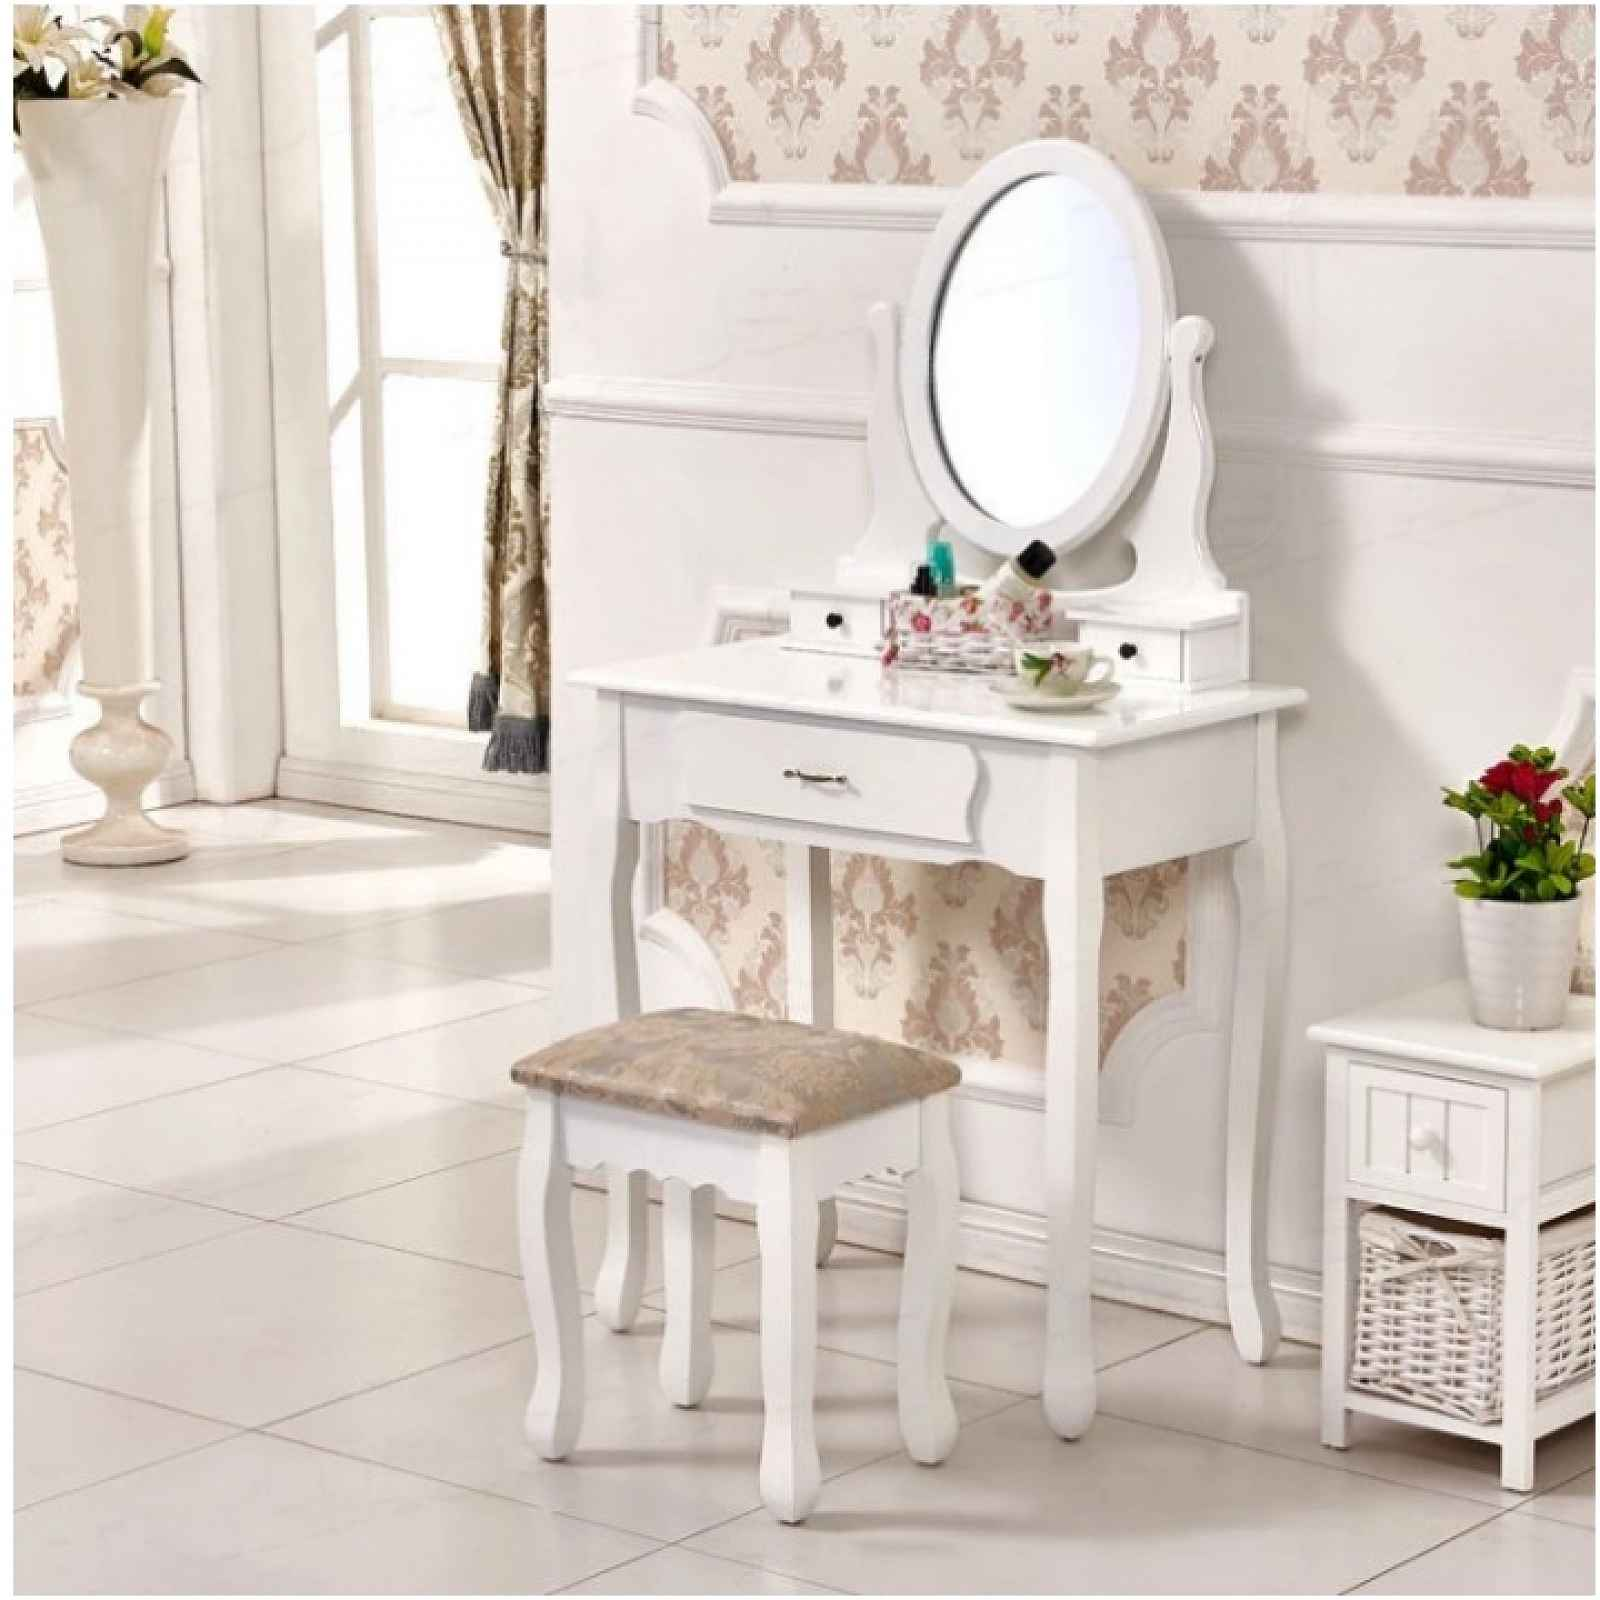 Toaletní stolek s taburetem, bílá / stříbrná, LINET New 0000228273 Tempo Kondela